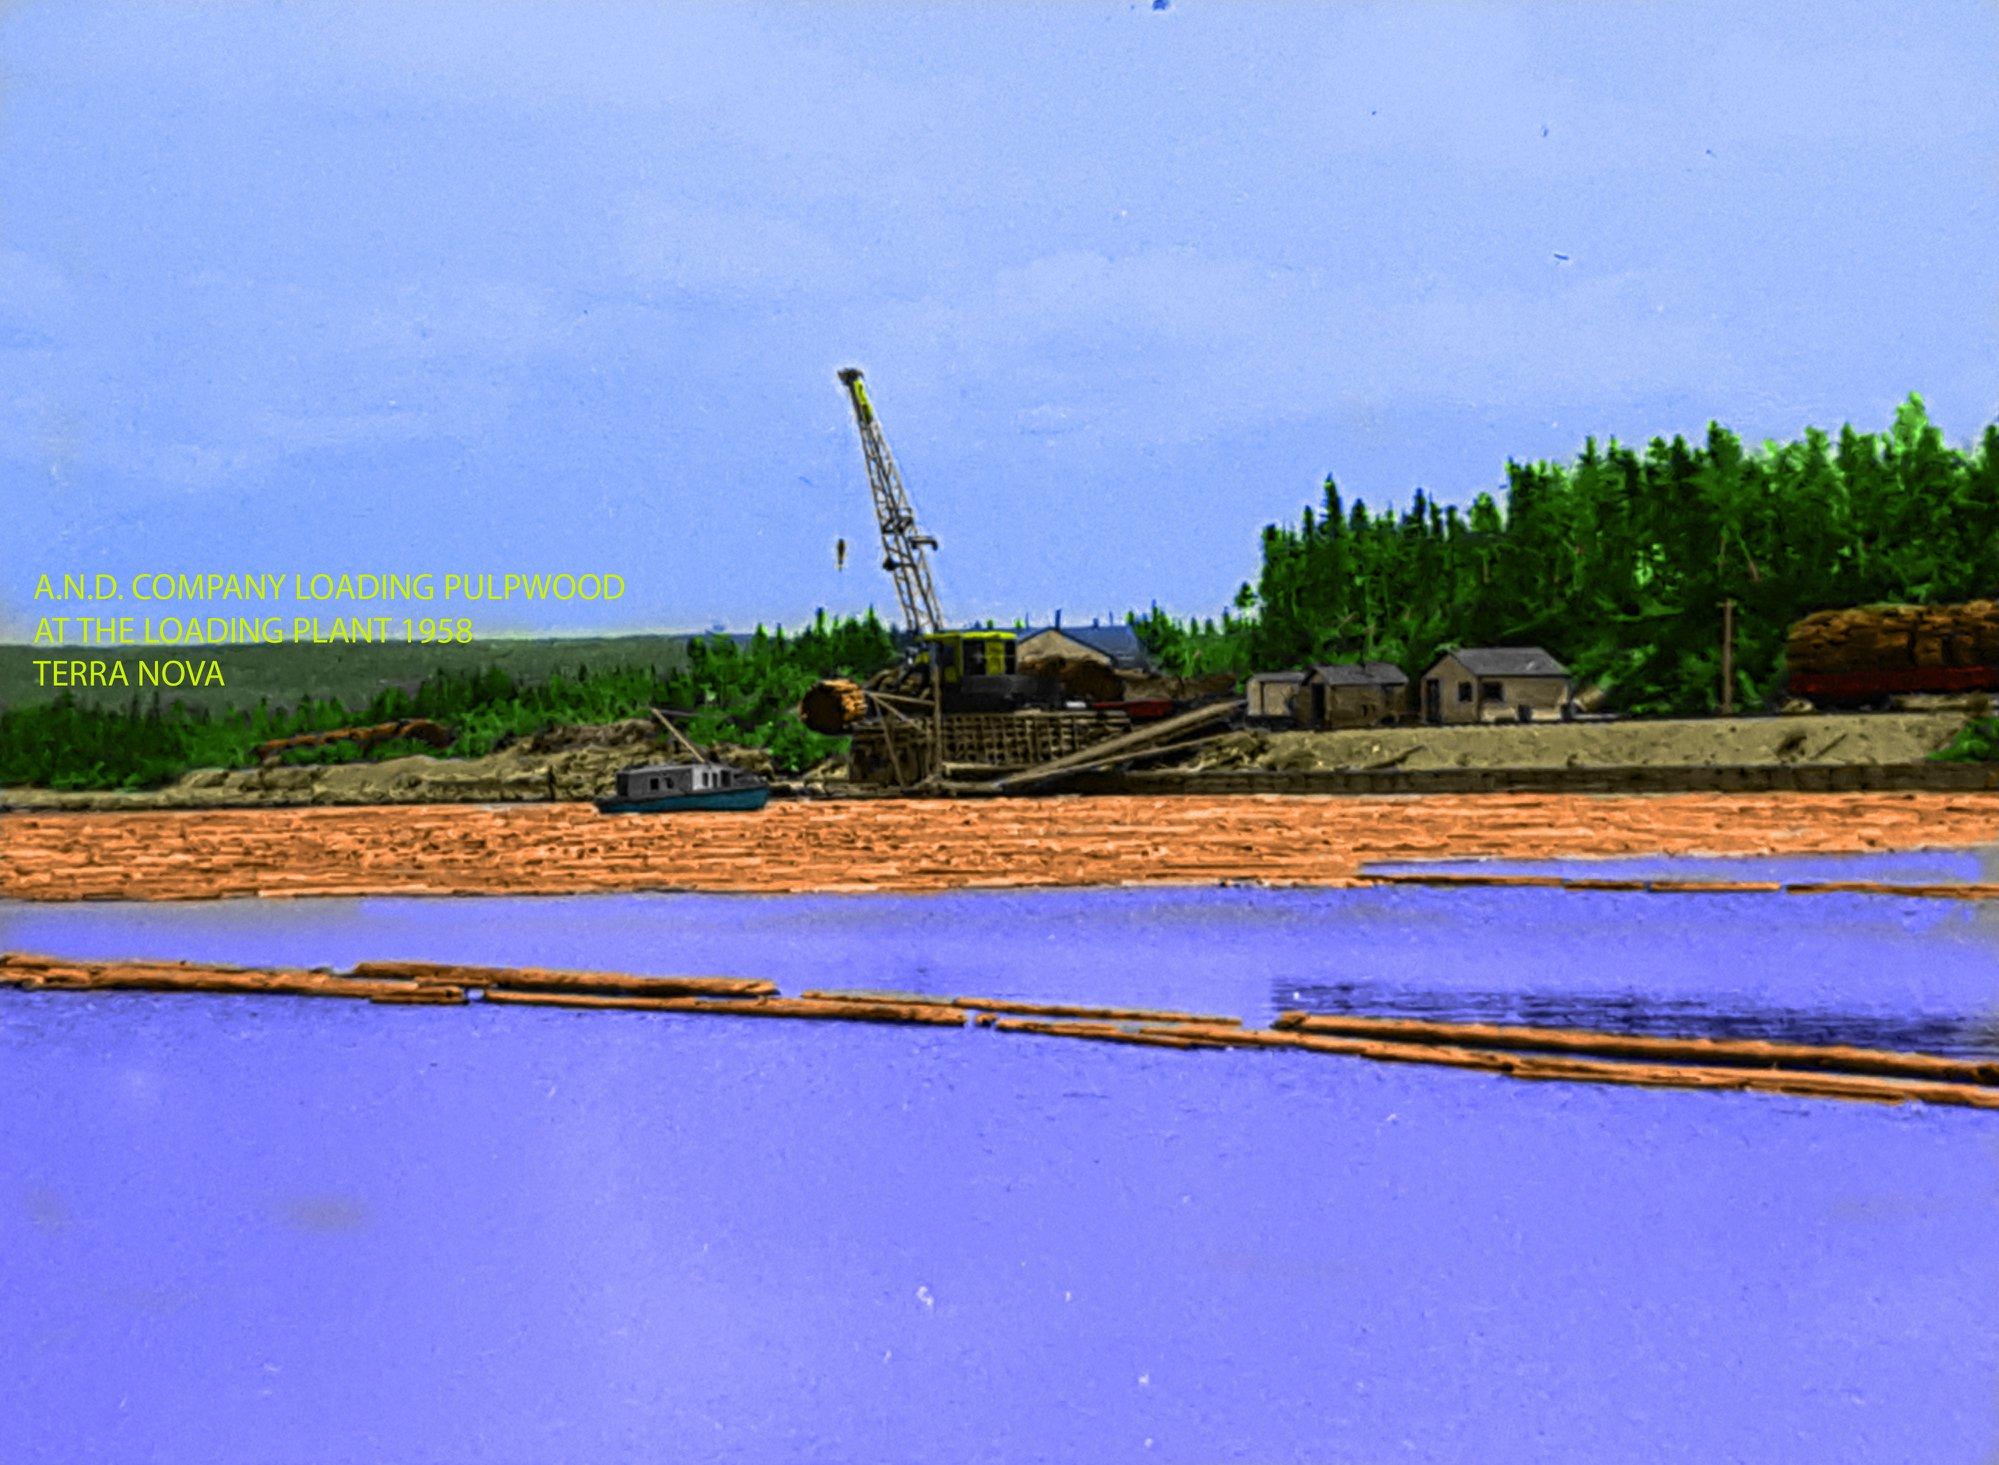 Terra Nova loading Plant Bond Noseworthy.jpg